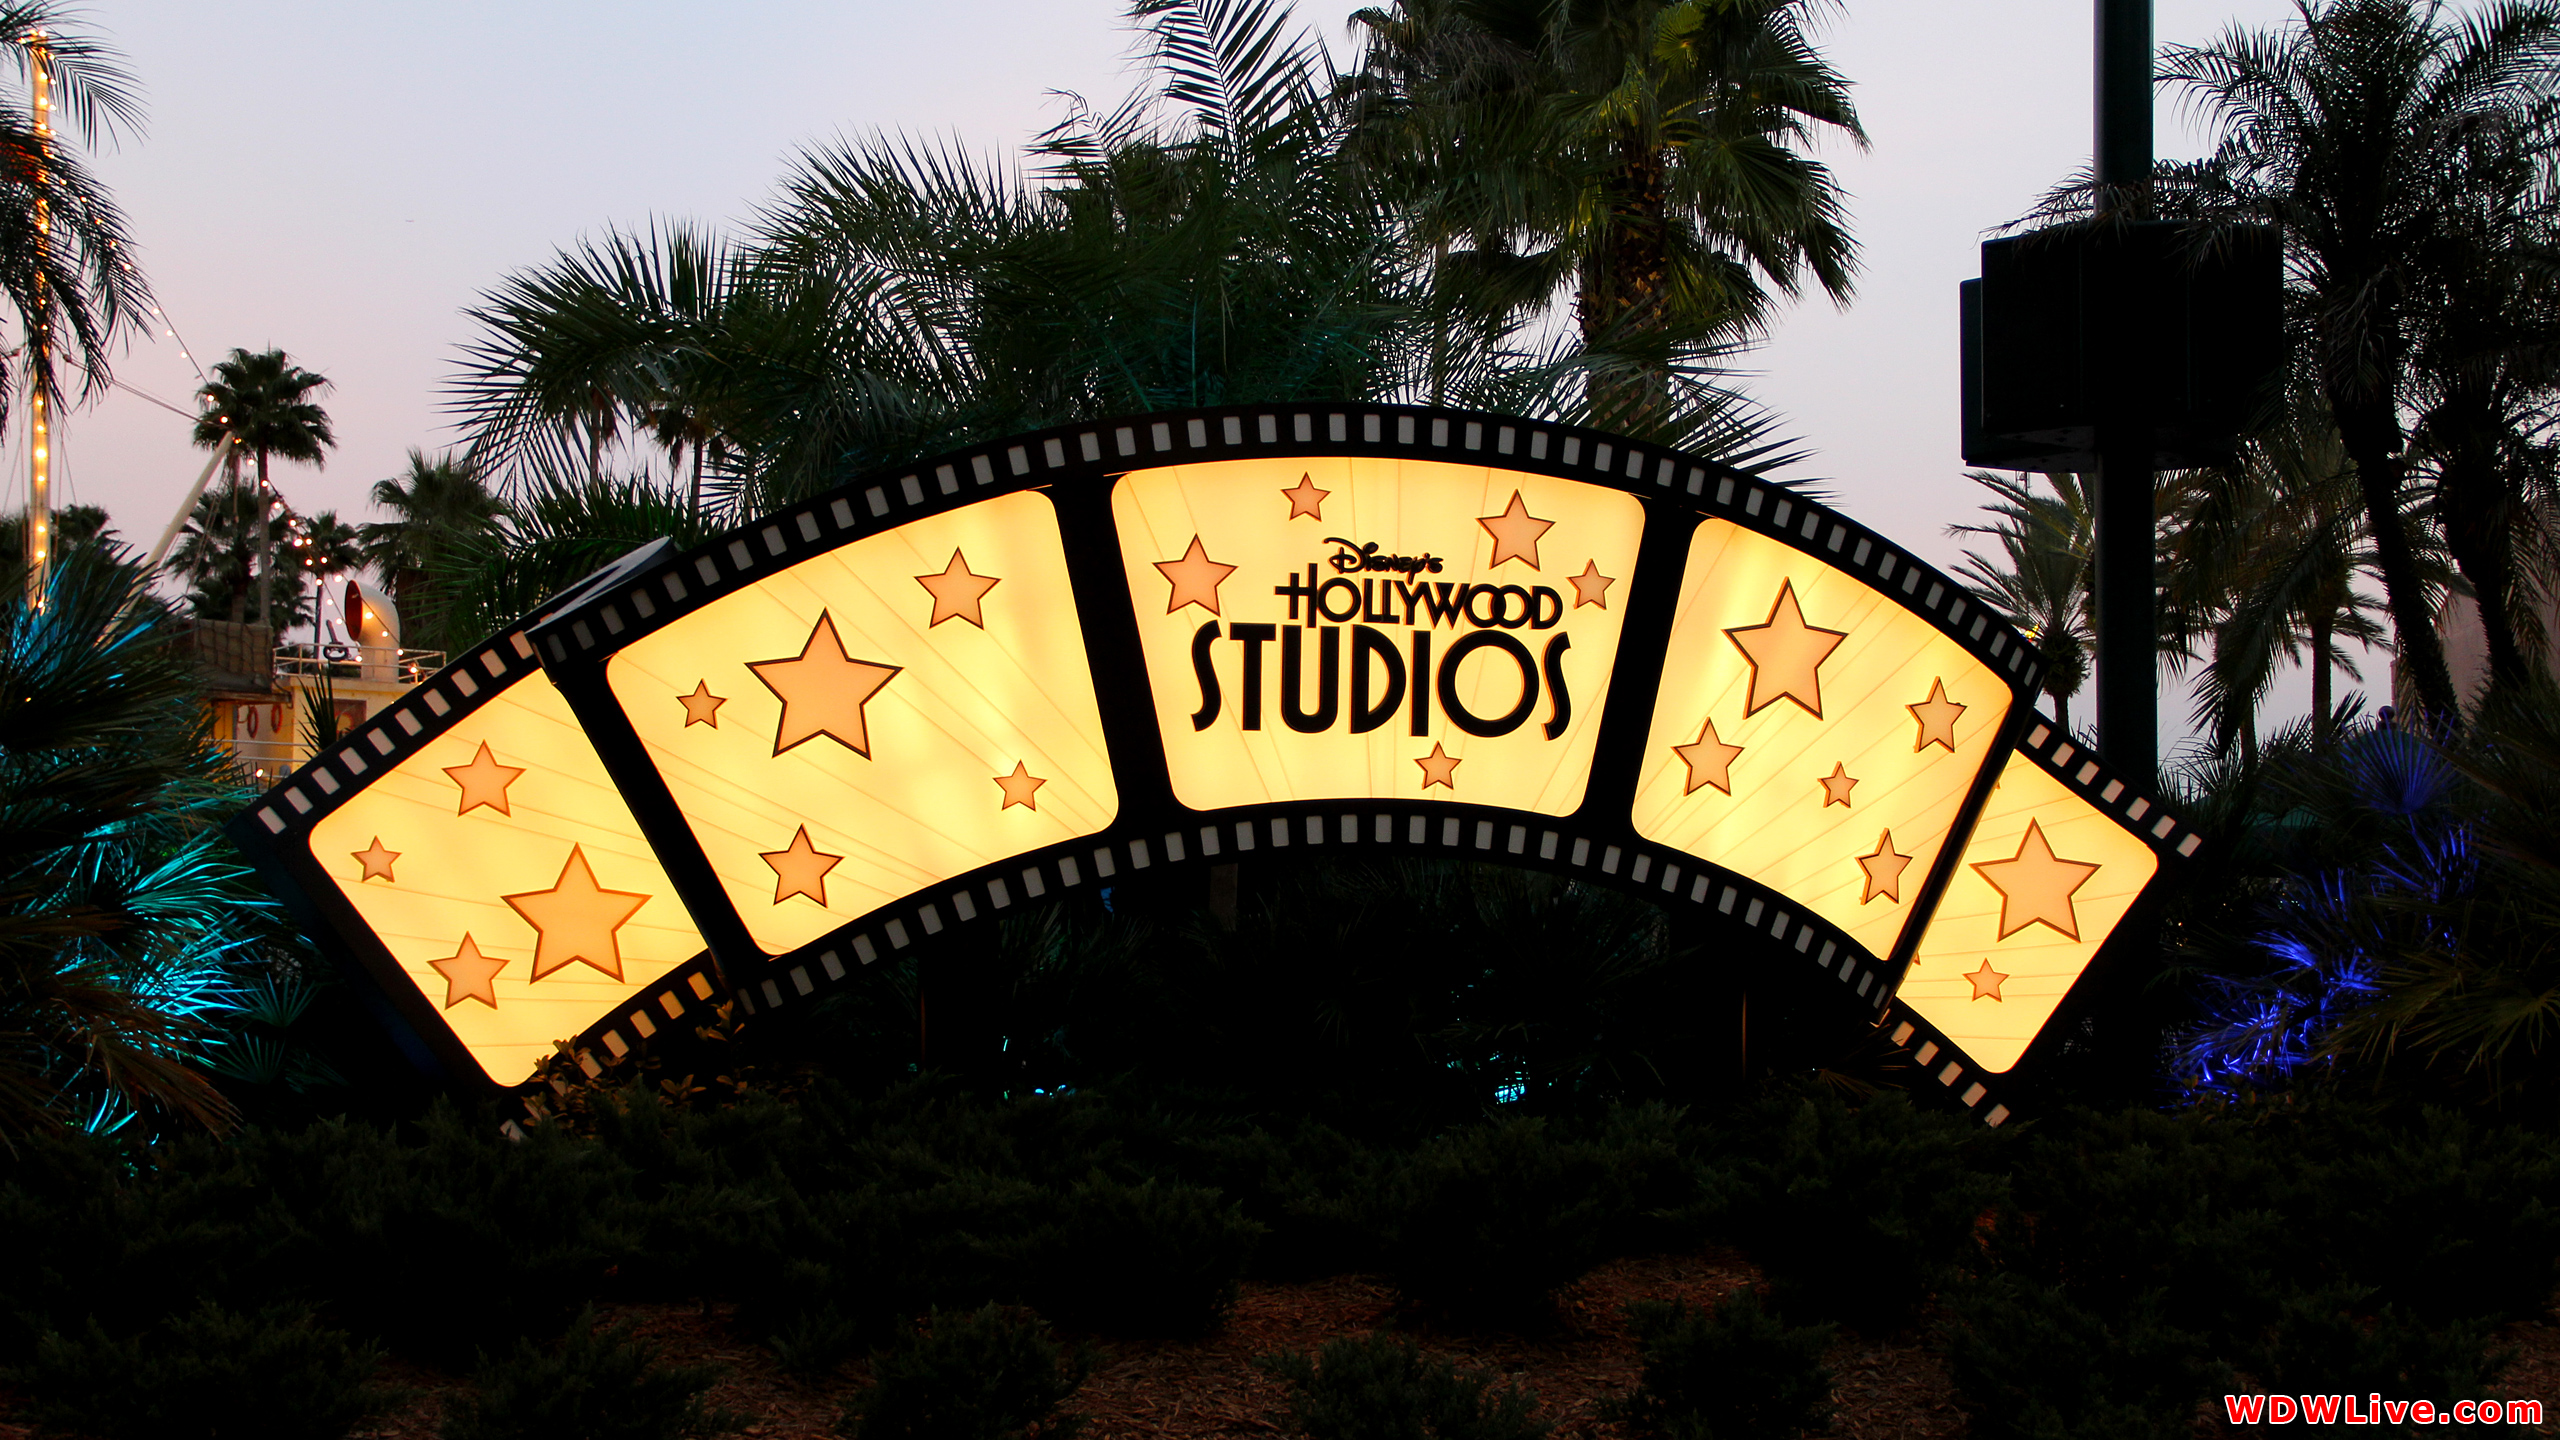 Hollywood Studios Wallpaper Hollywood boulevard desktop 2560x1440